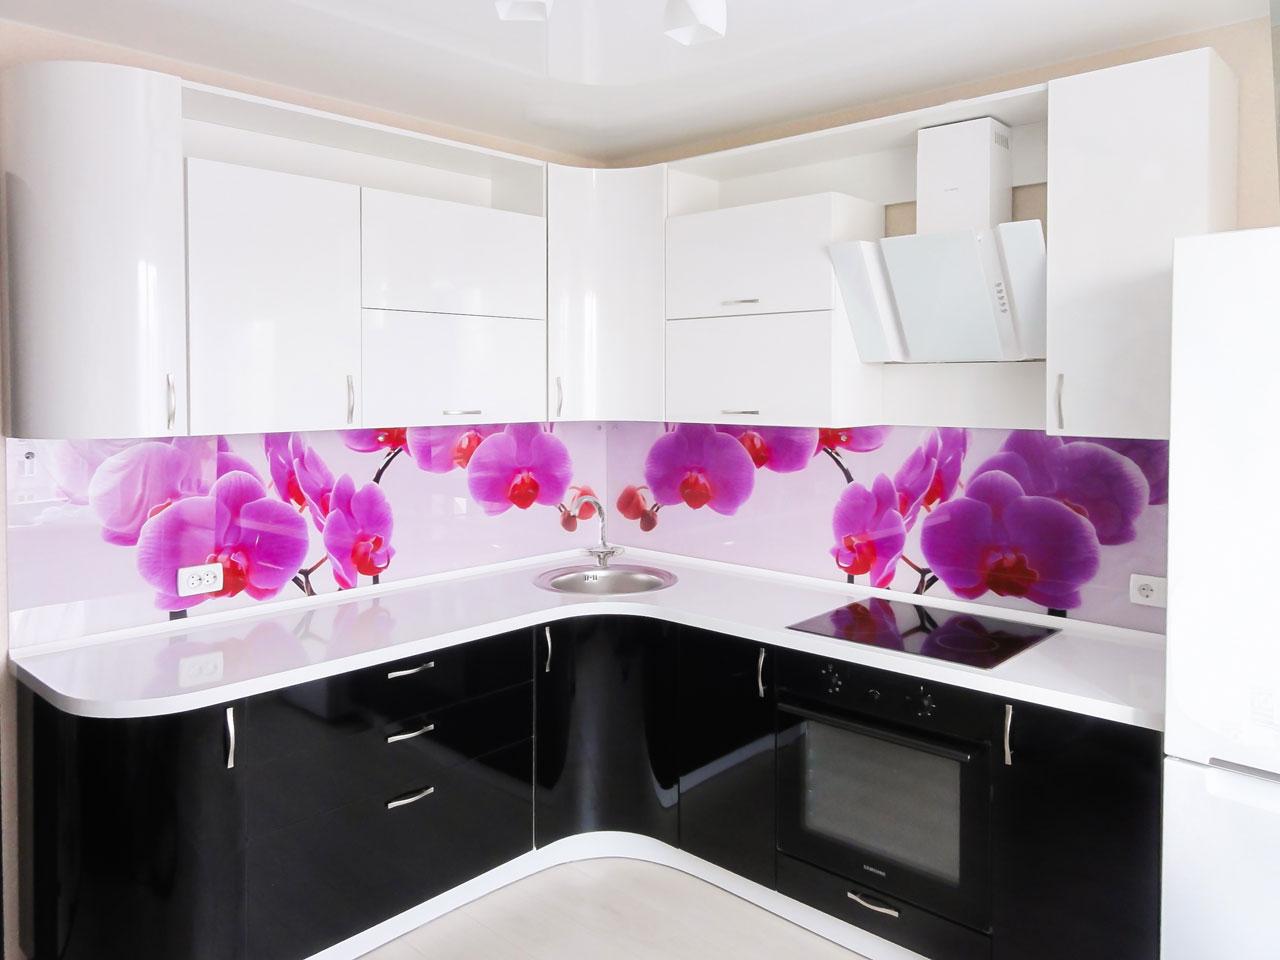 фартук для кухни с яркими цветами